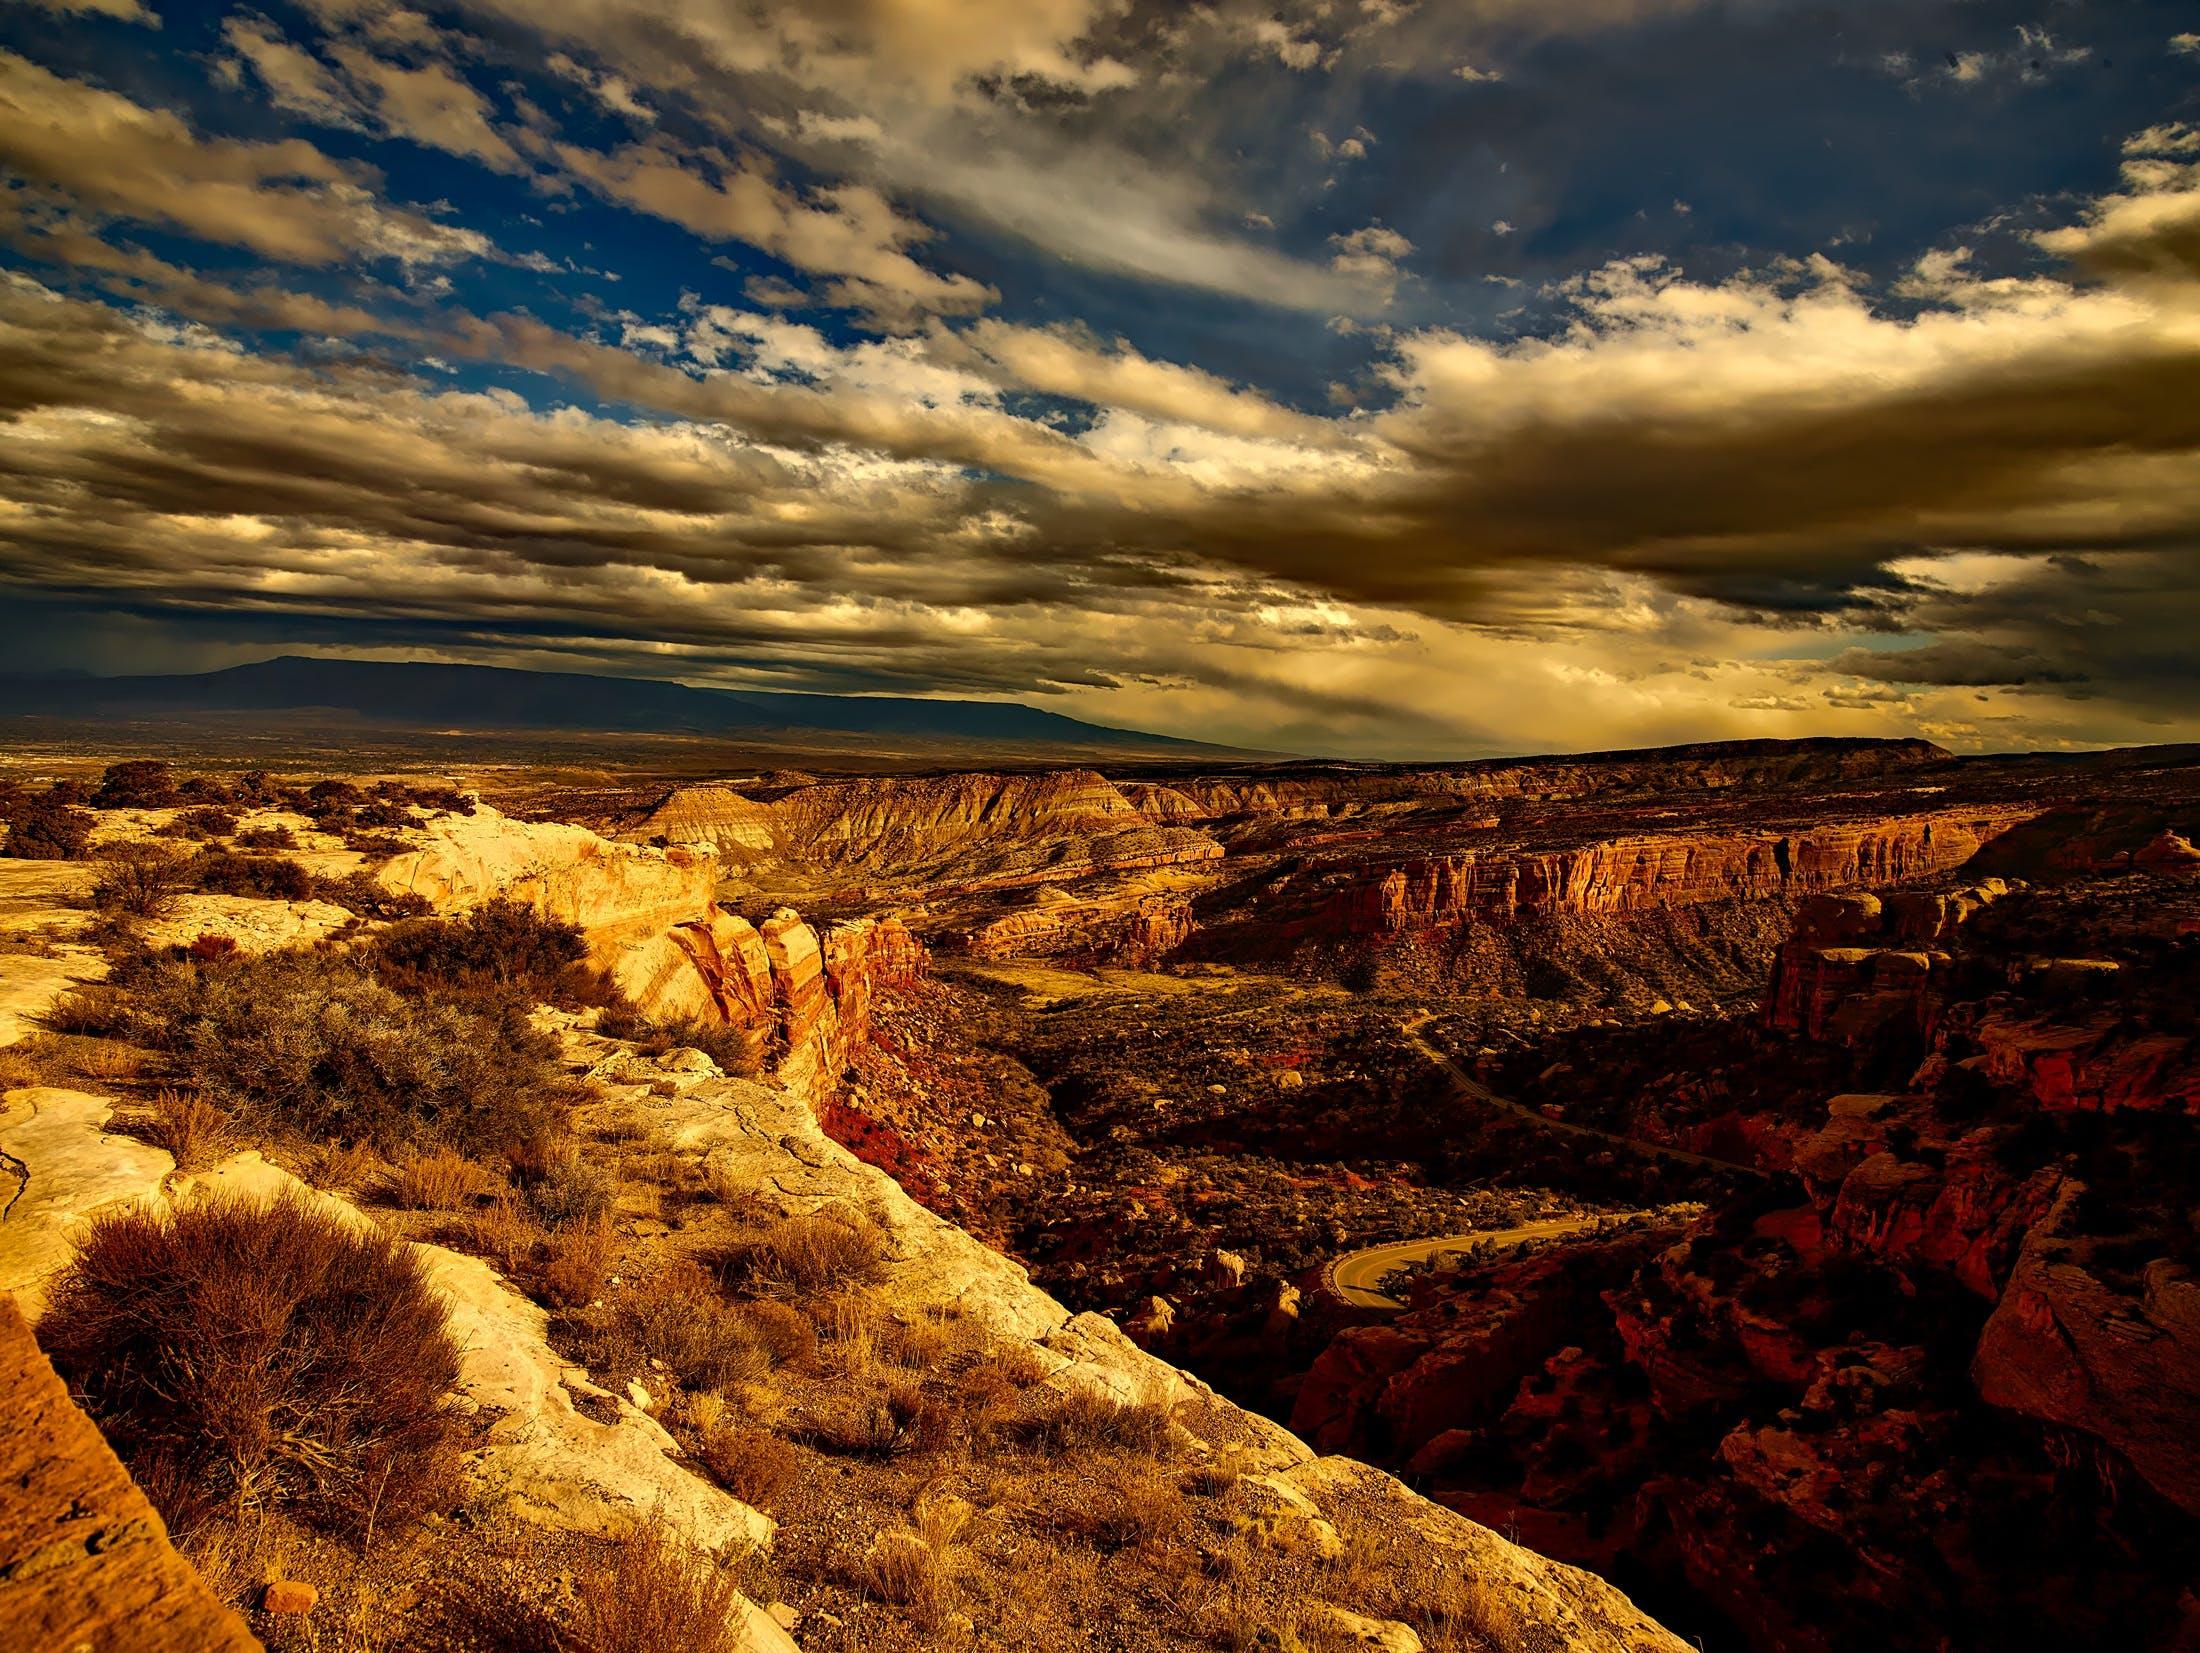 Kostenloses Stock Foto zu canyon, dämmerung, felsig, geologie